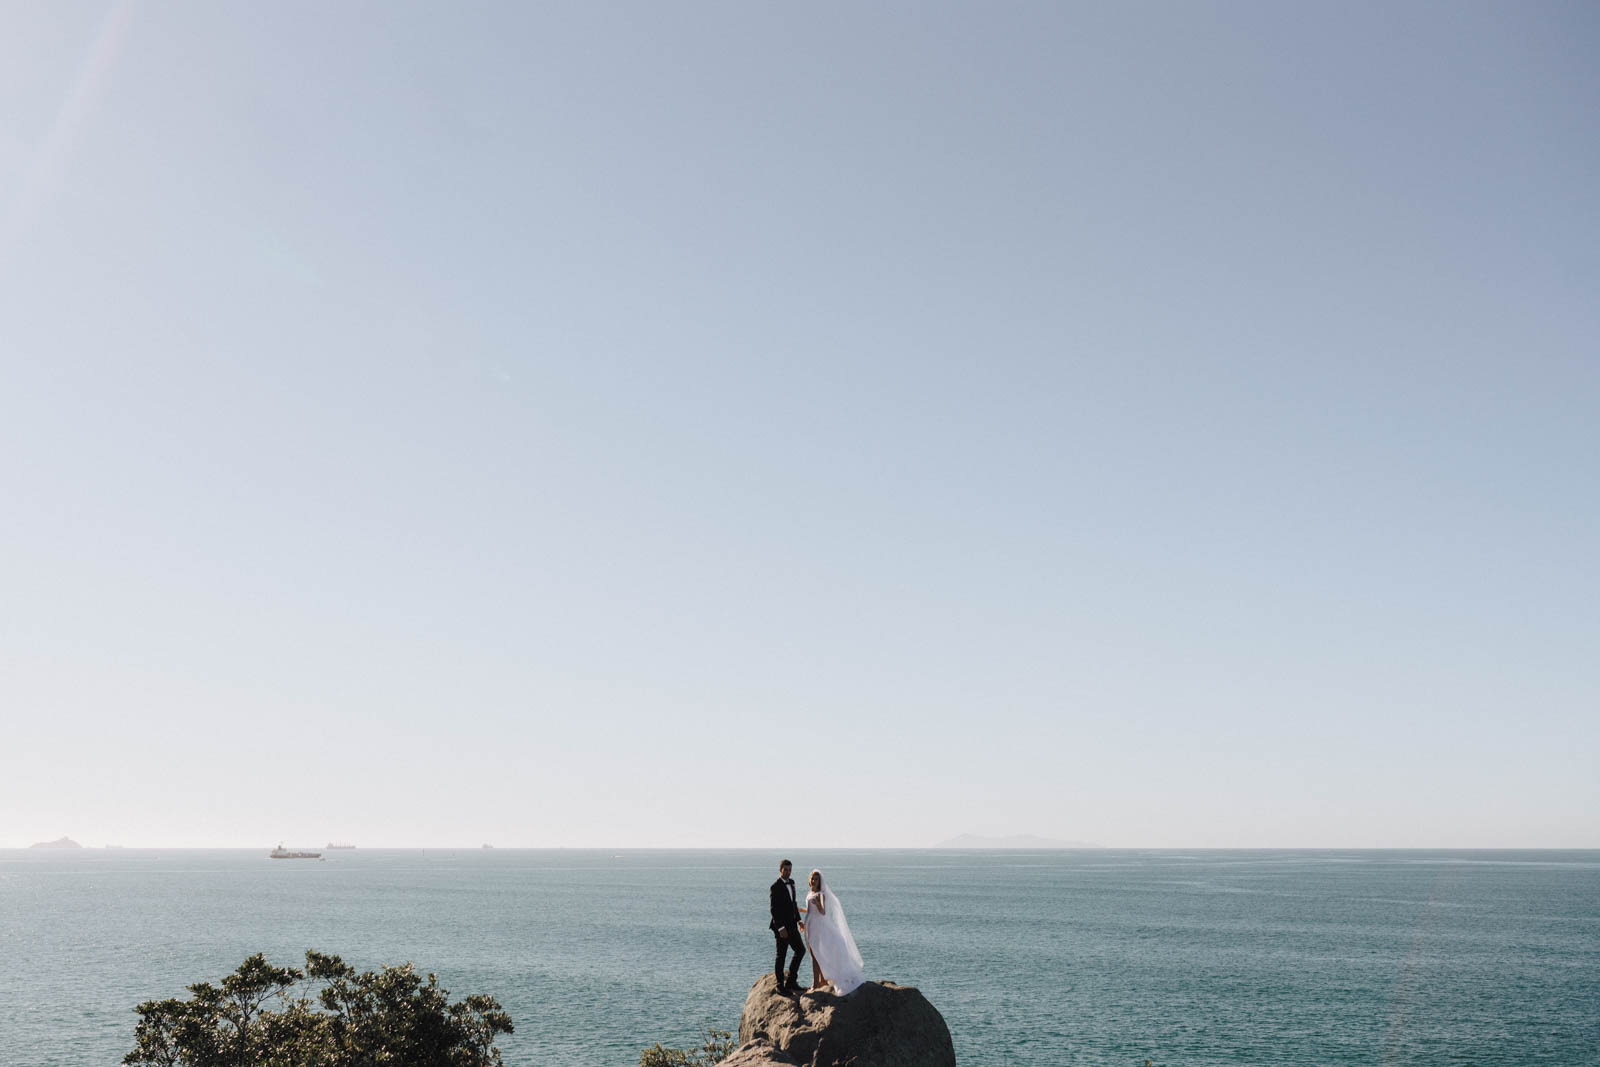 newfound-s-p-mt-maunganui-tauranga-wedding-photographer-1537-LQ109710